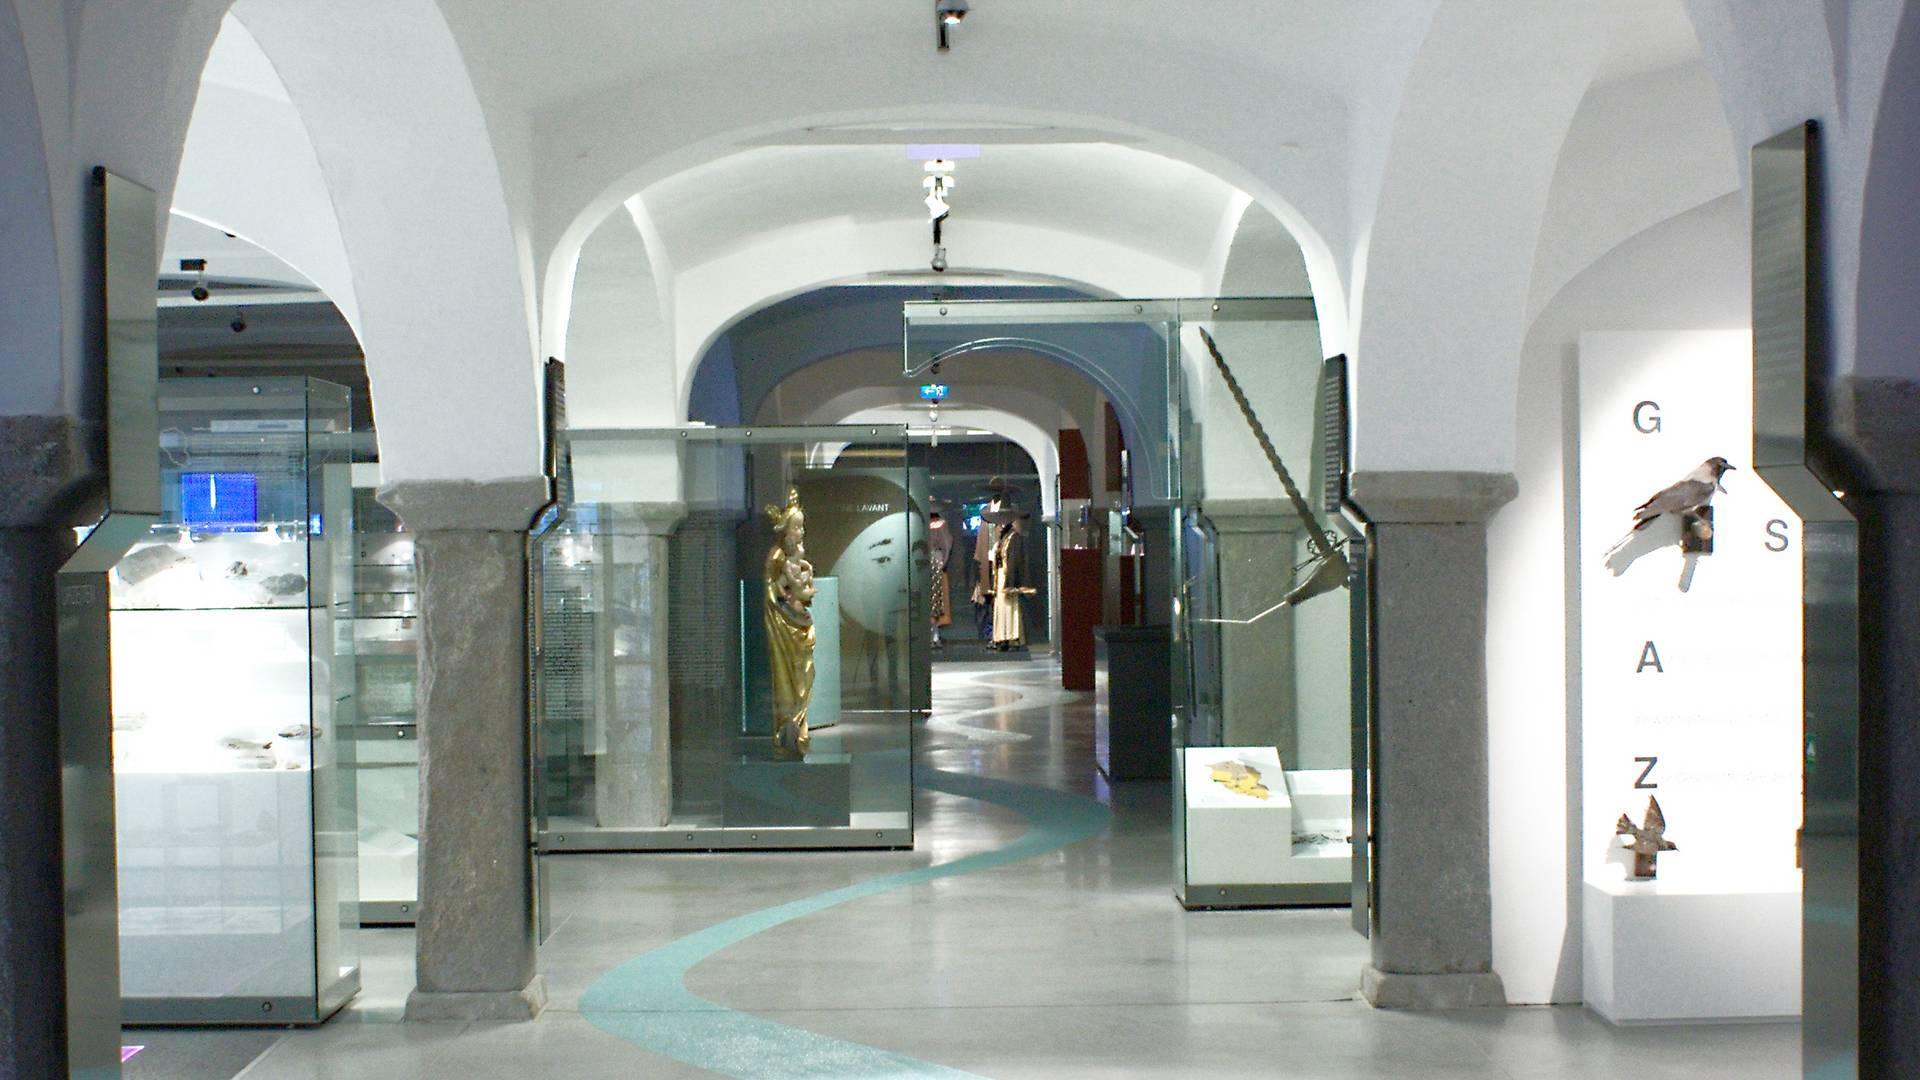 Museum im Lavanthaus Einblick